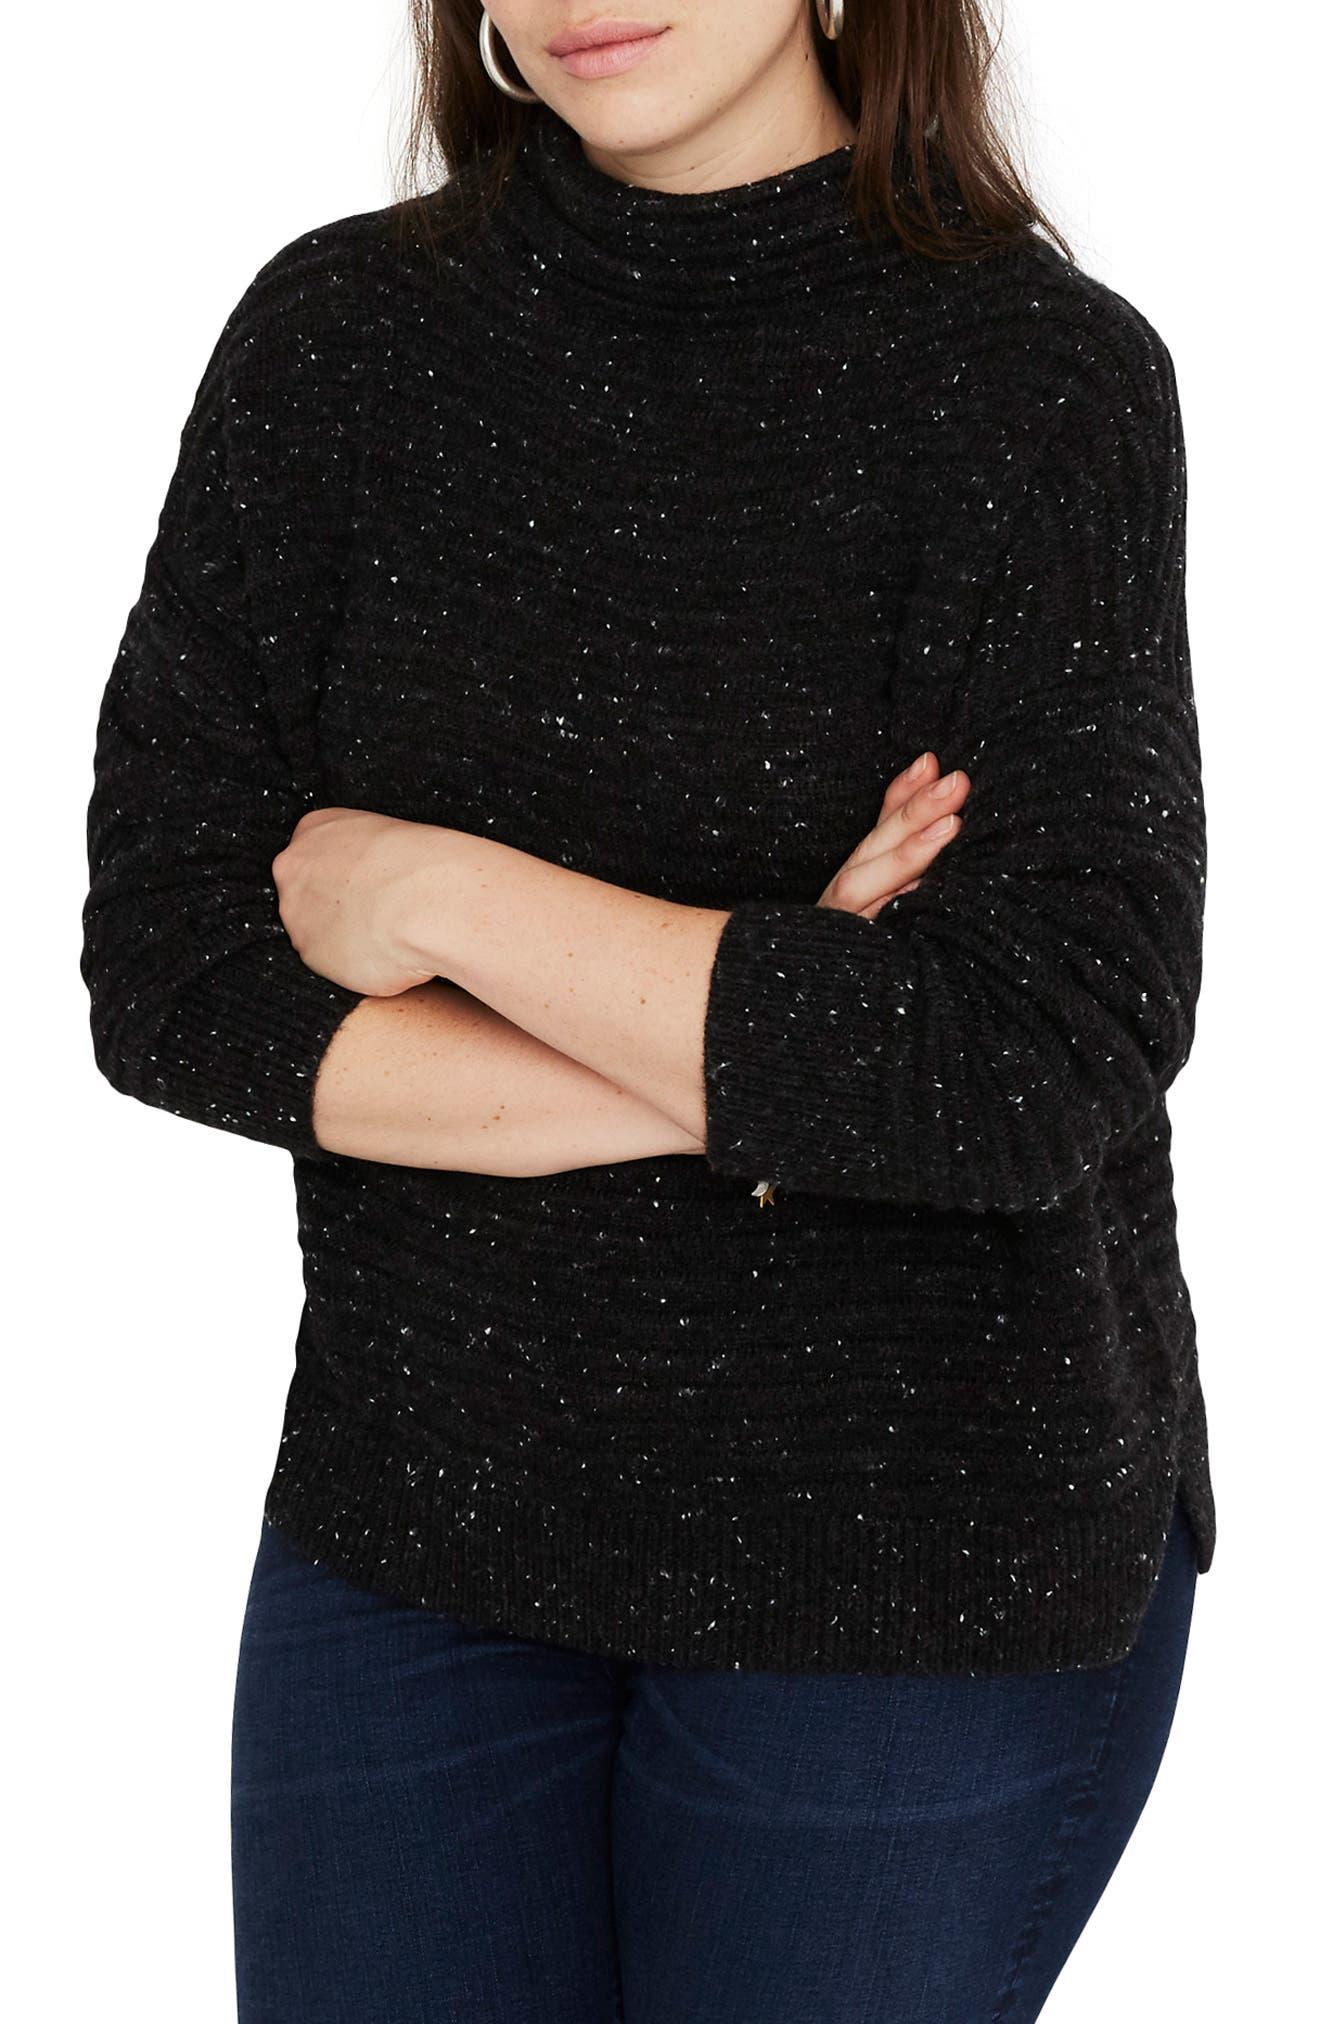 Belmont Donegal Mock Neck Sweater,                             Alternate thumbnail 2, color,                             DONEGAL STORM